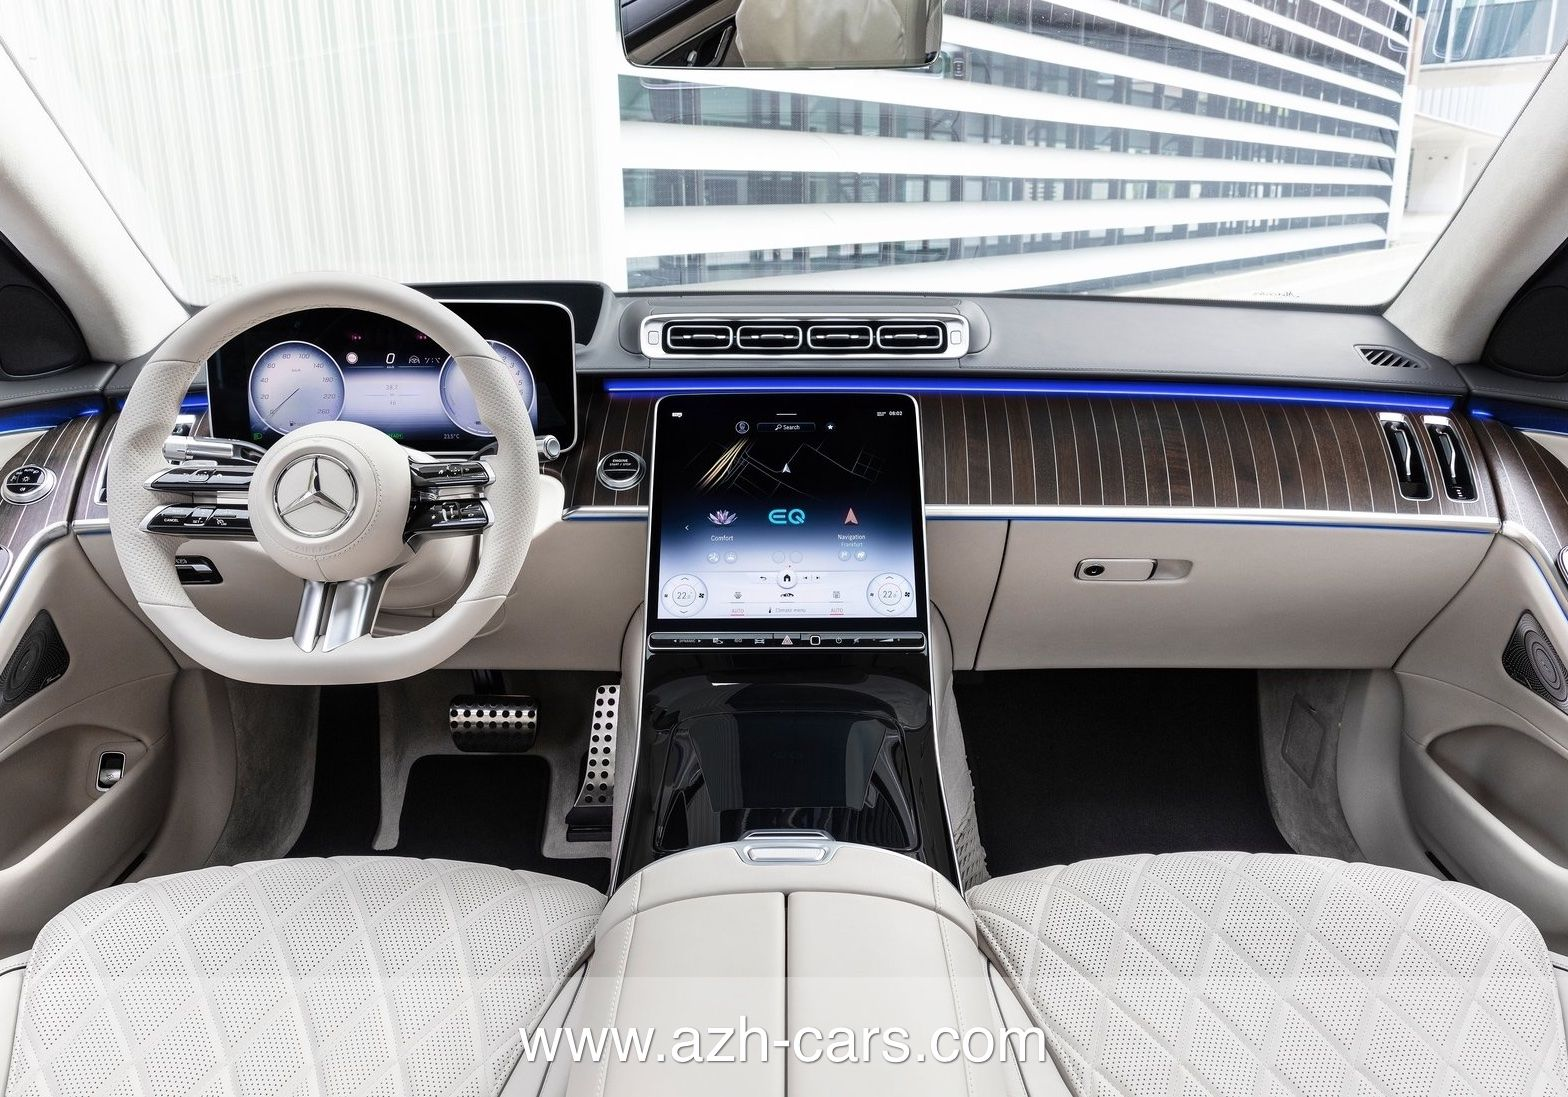 2021 Mercedes Benz S Class Plug In Hybrid W223 Mercedes S Class Benz S Class Benz S